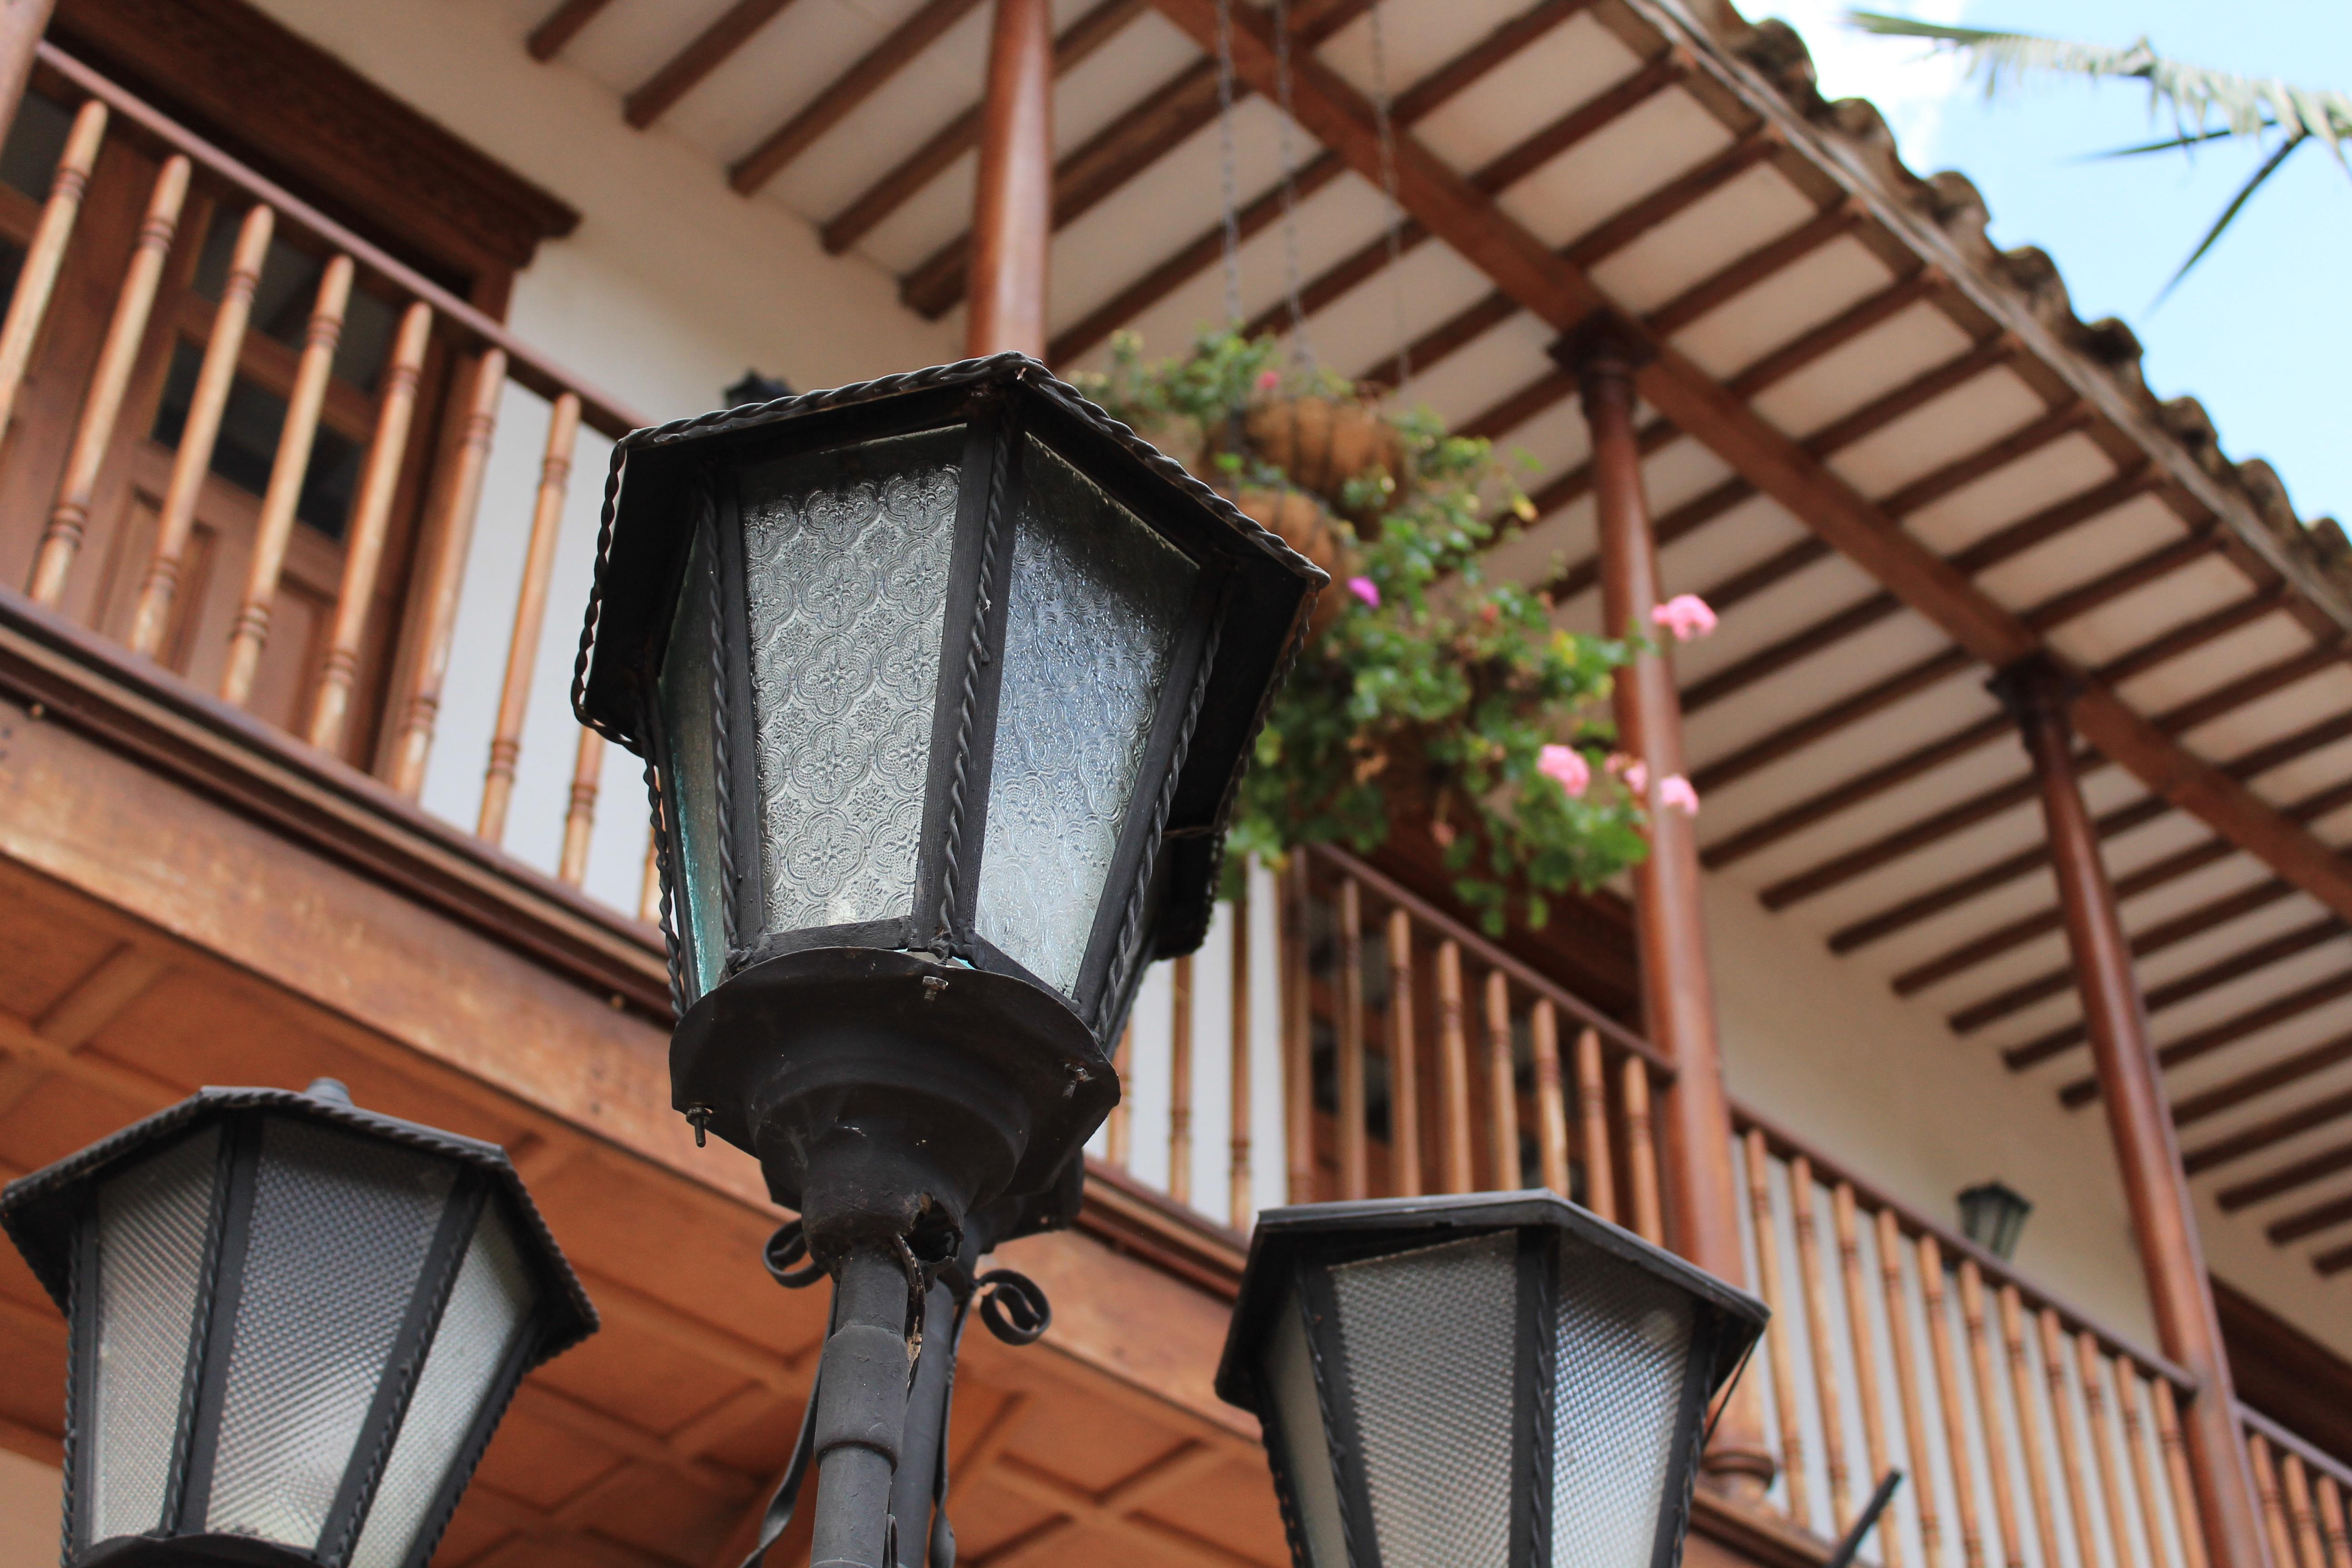 Gratis Afbeeldingen : architectuur, venster, dak, balkon, lantaarn ...